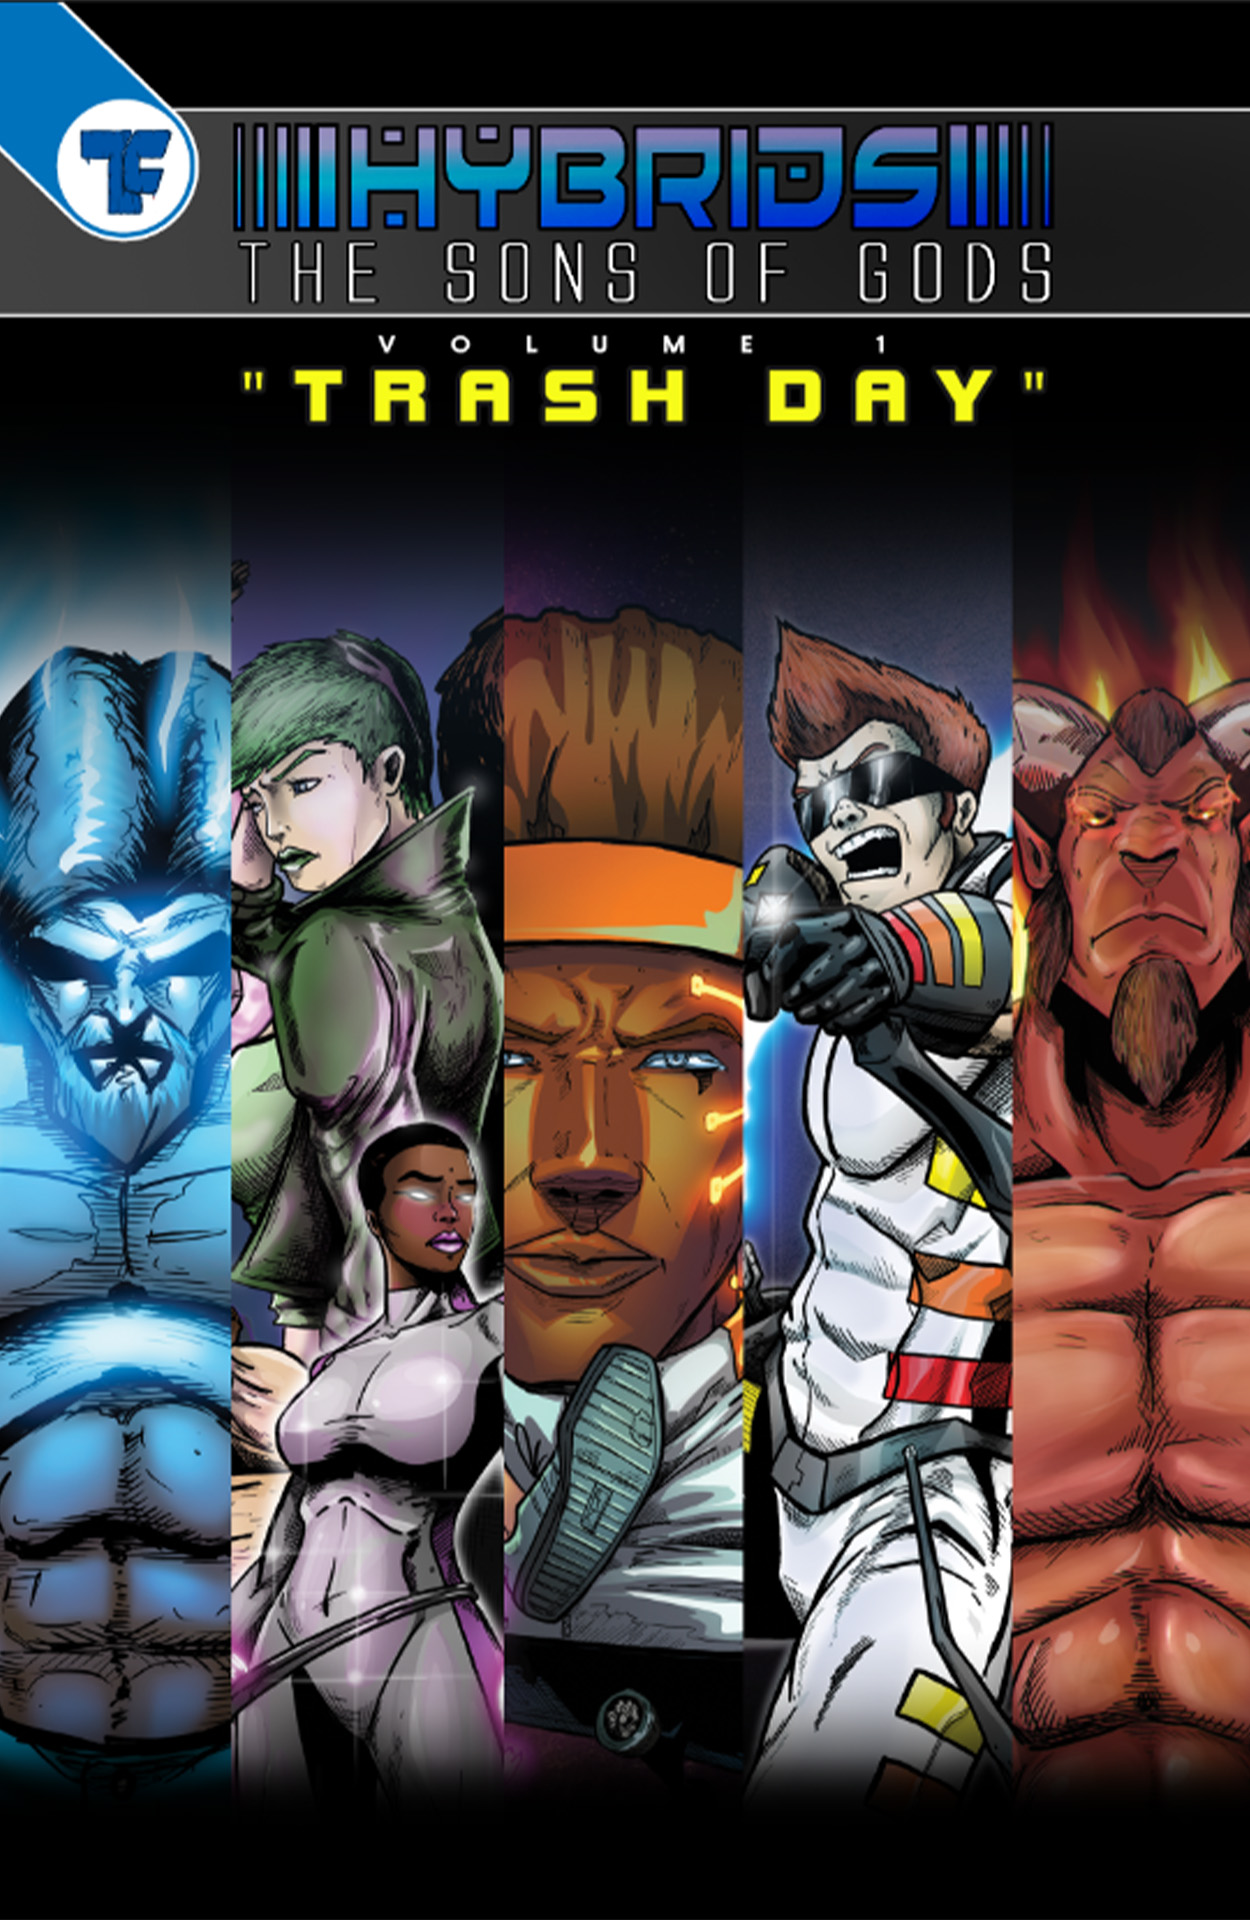 Hybrids: The Sons of Gods-Trash Day Graphic Novel